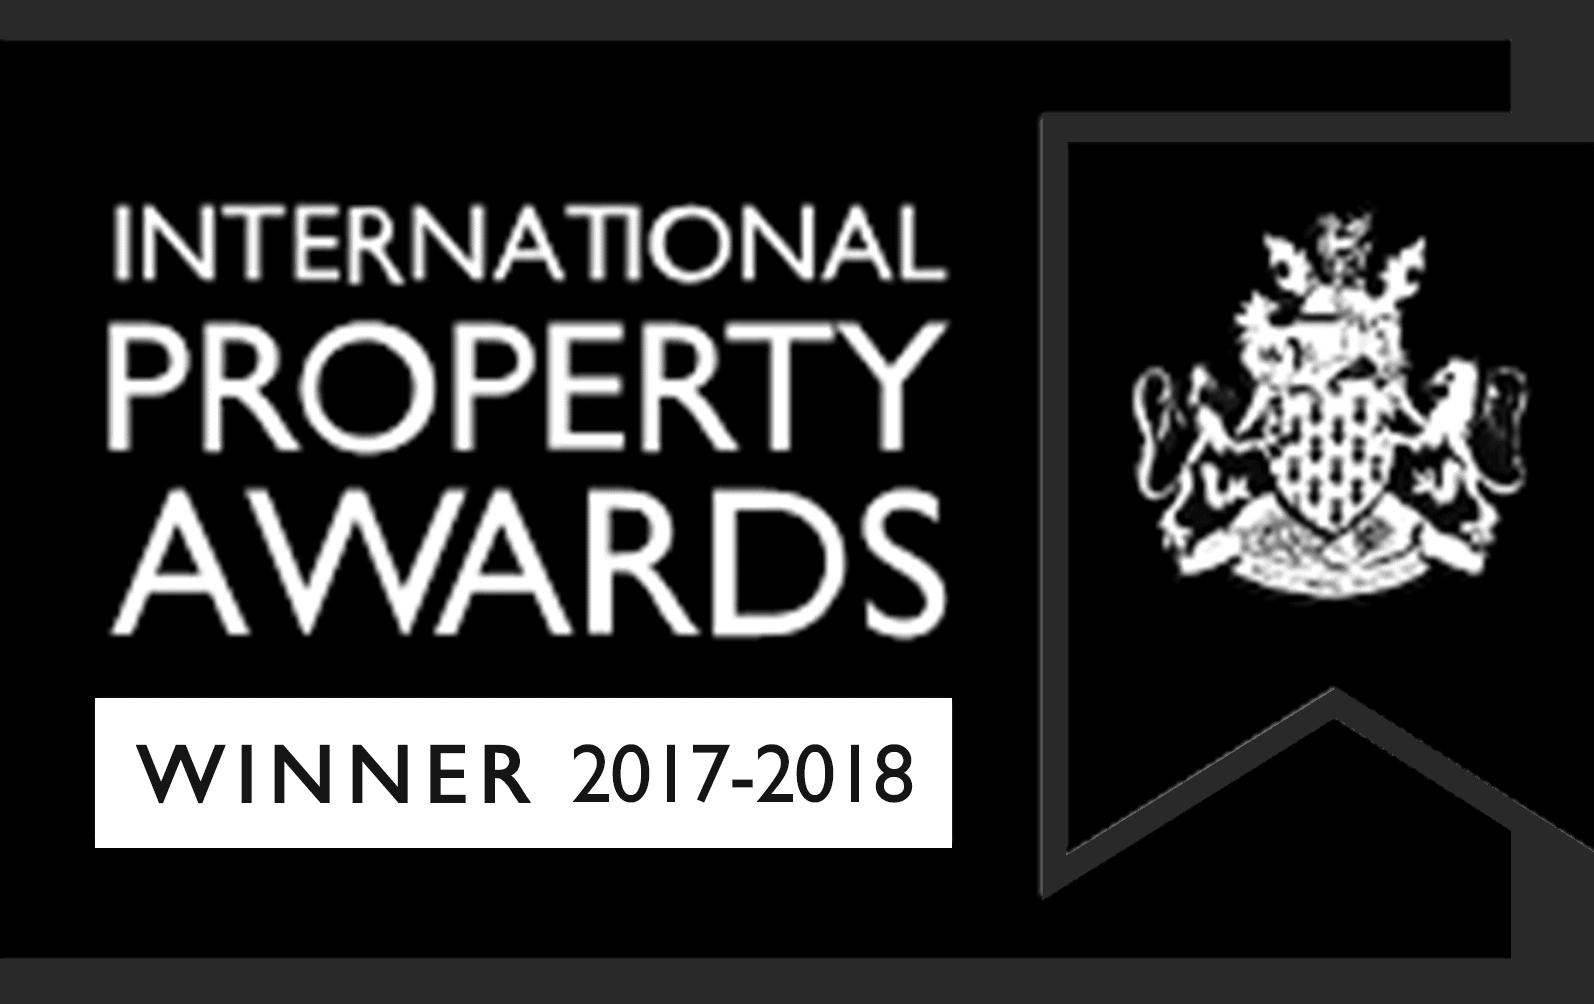 International Property Awards 2017-18